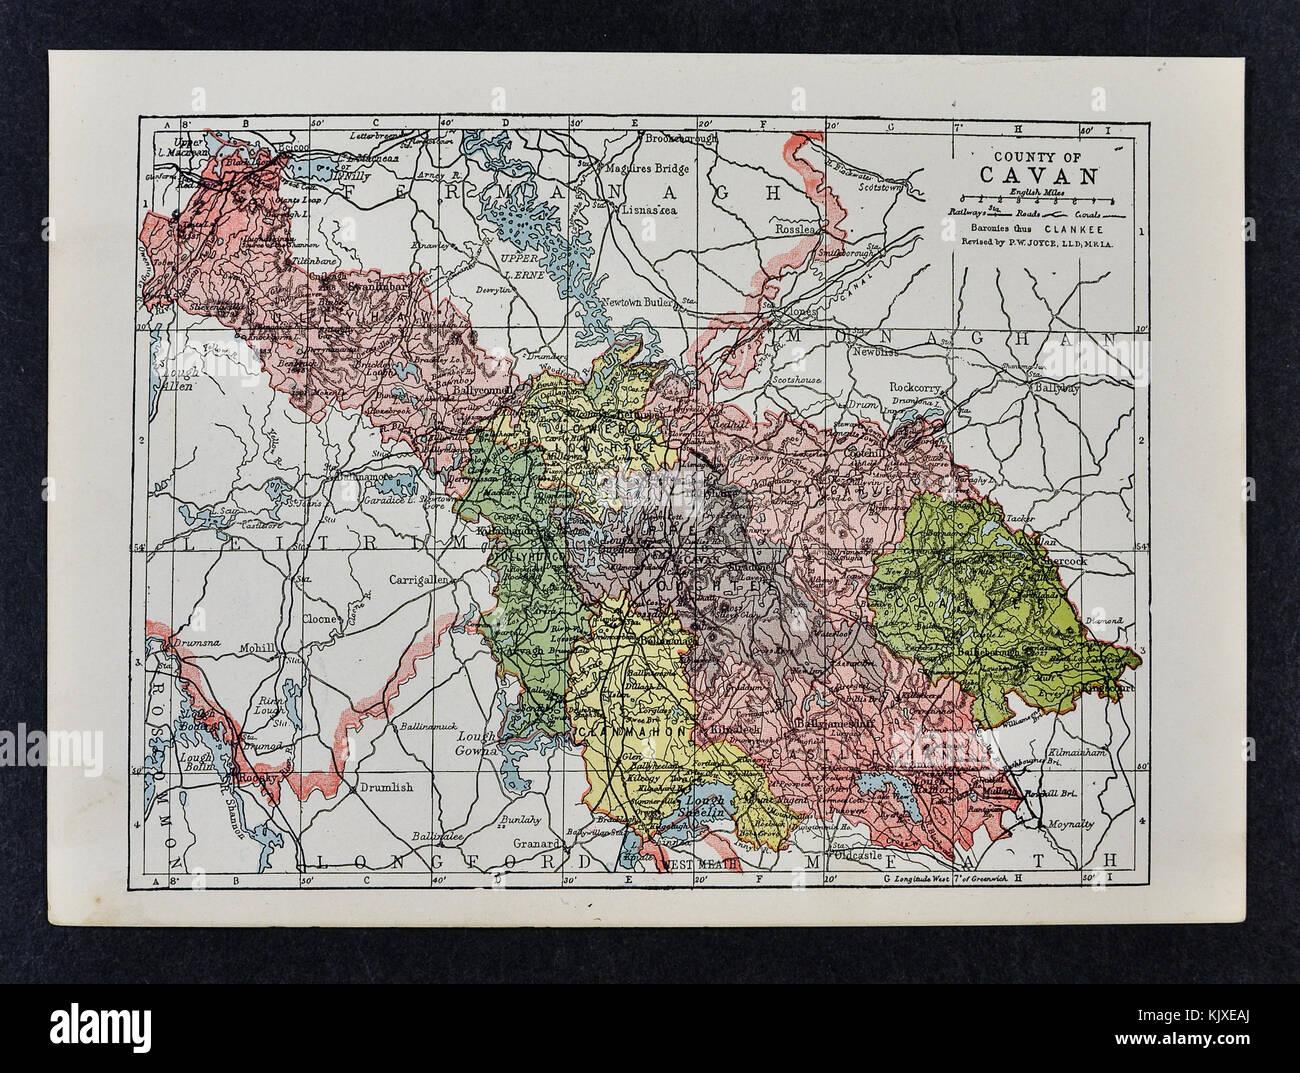 Antique Ireland Map - Cavan County - Ballyconnell Swanlinbar Black Lion Shercock - Stock Image